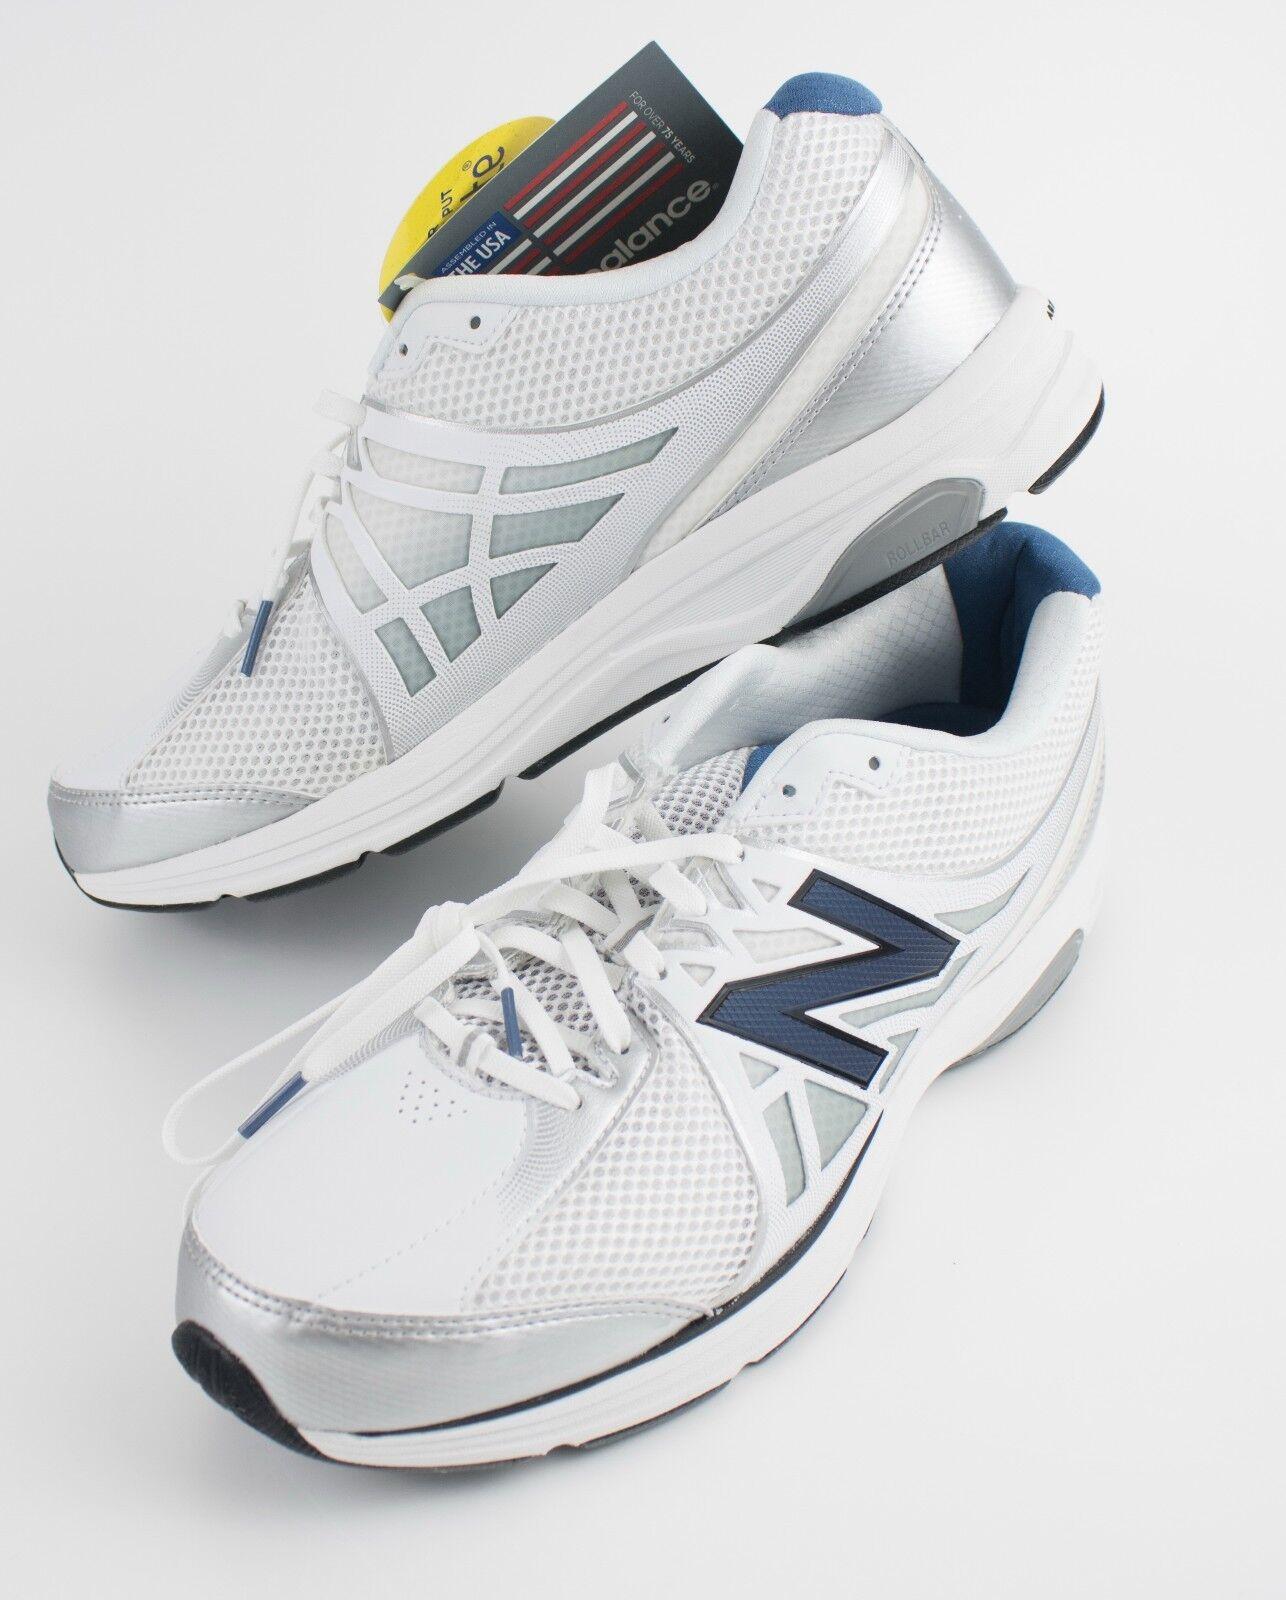 NEW BALANCE Mens MW847WT2 WALKING Sneakers